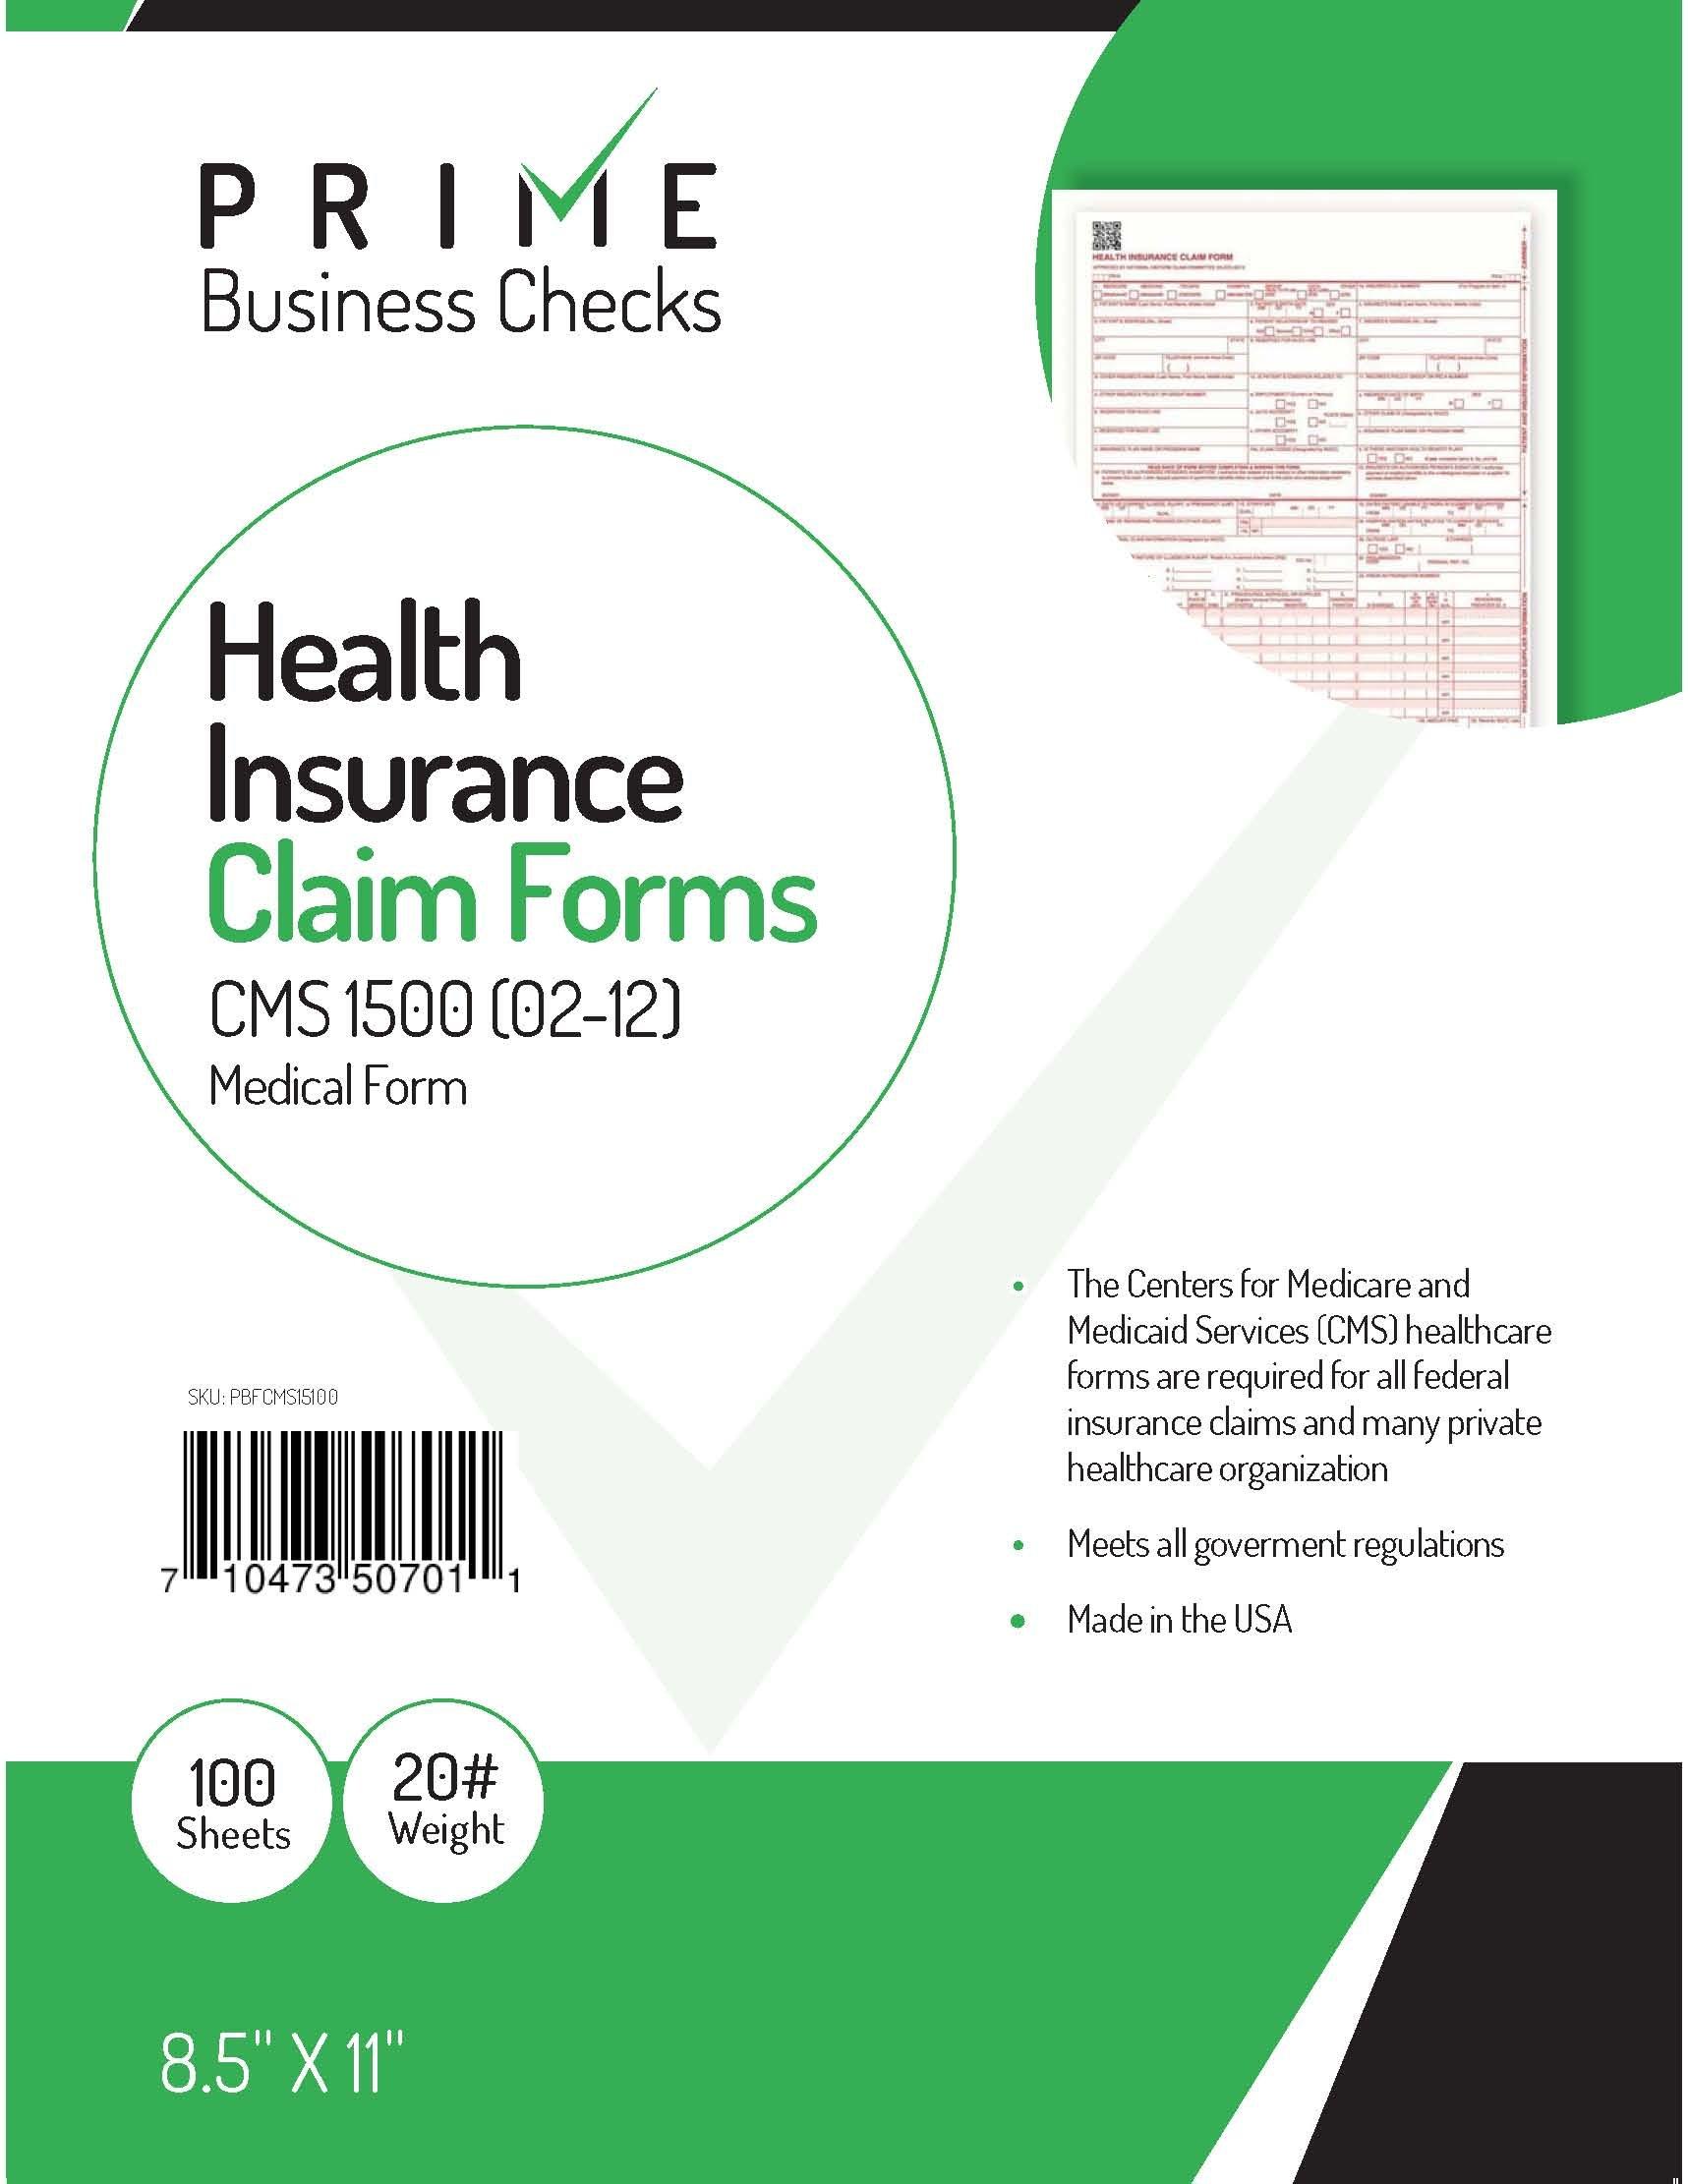 CMS 1500 Claim Forms ''NEW'' HCFA (Version 02/12) - Health Insurance, Laser Cut Sheet - 100 Sheets